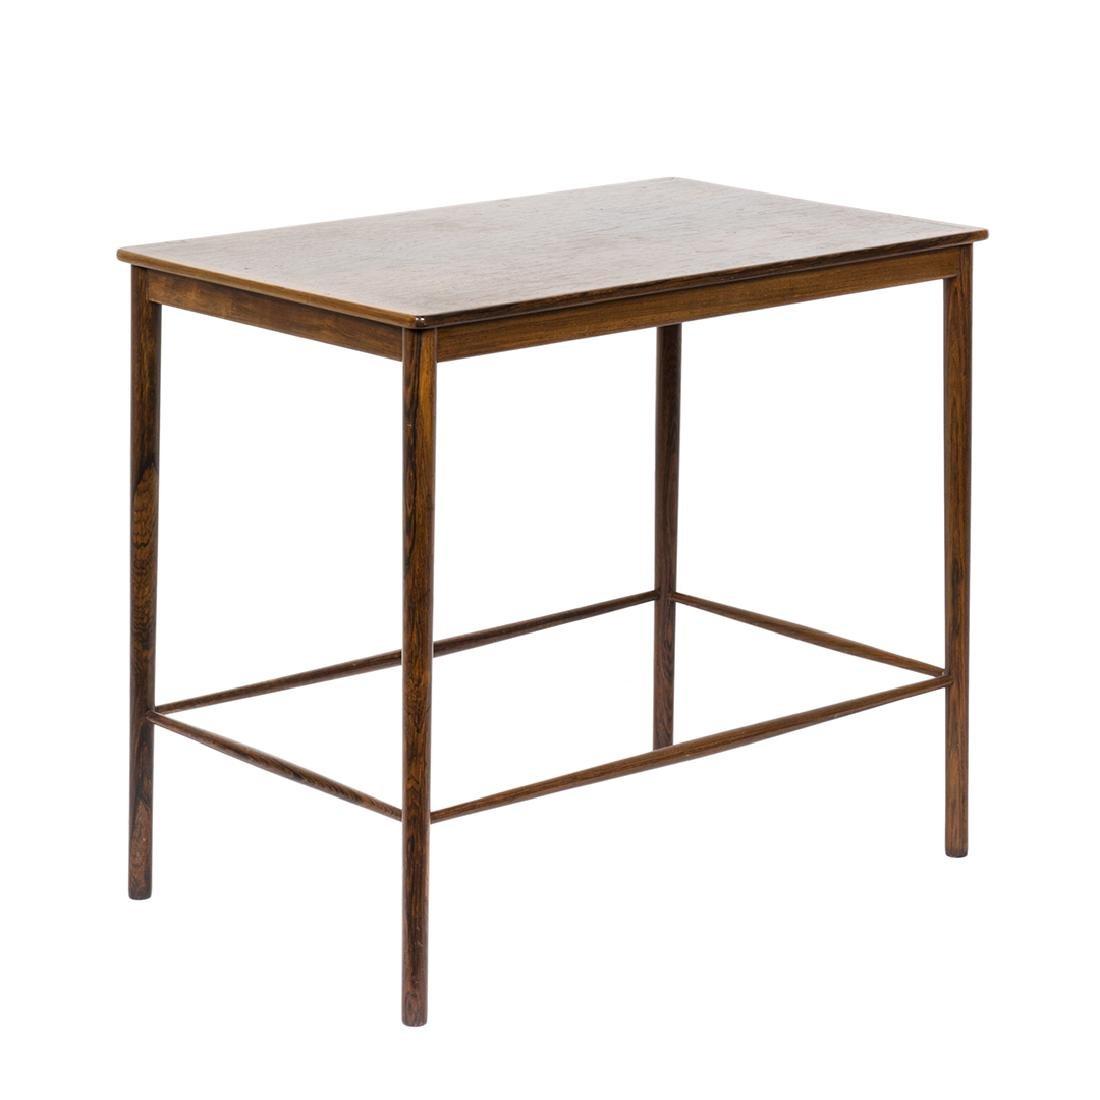 Grete Jalk Rosewood Side Table - 2